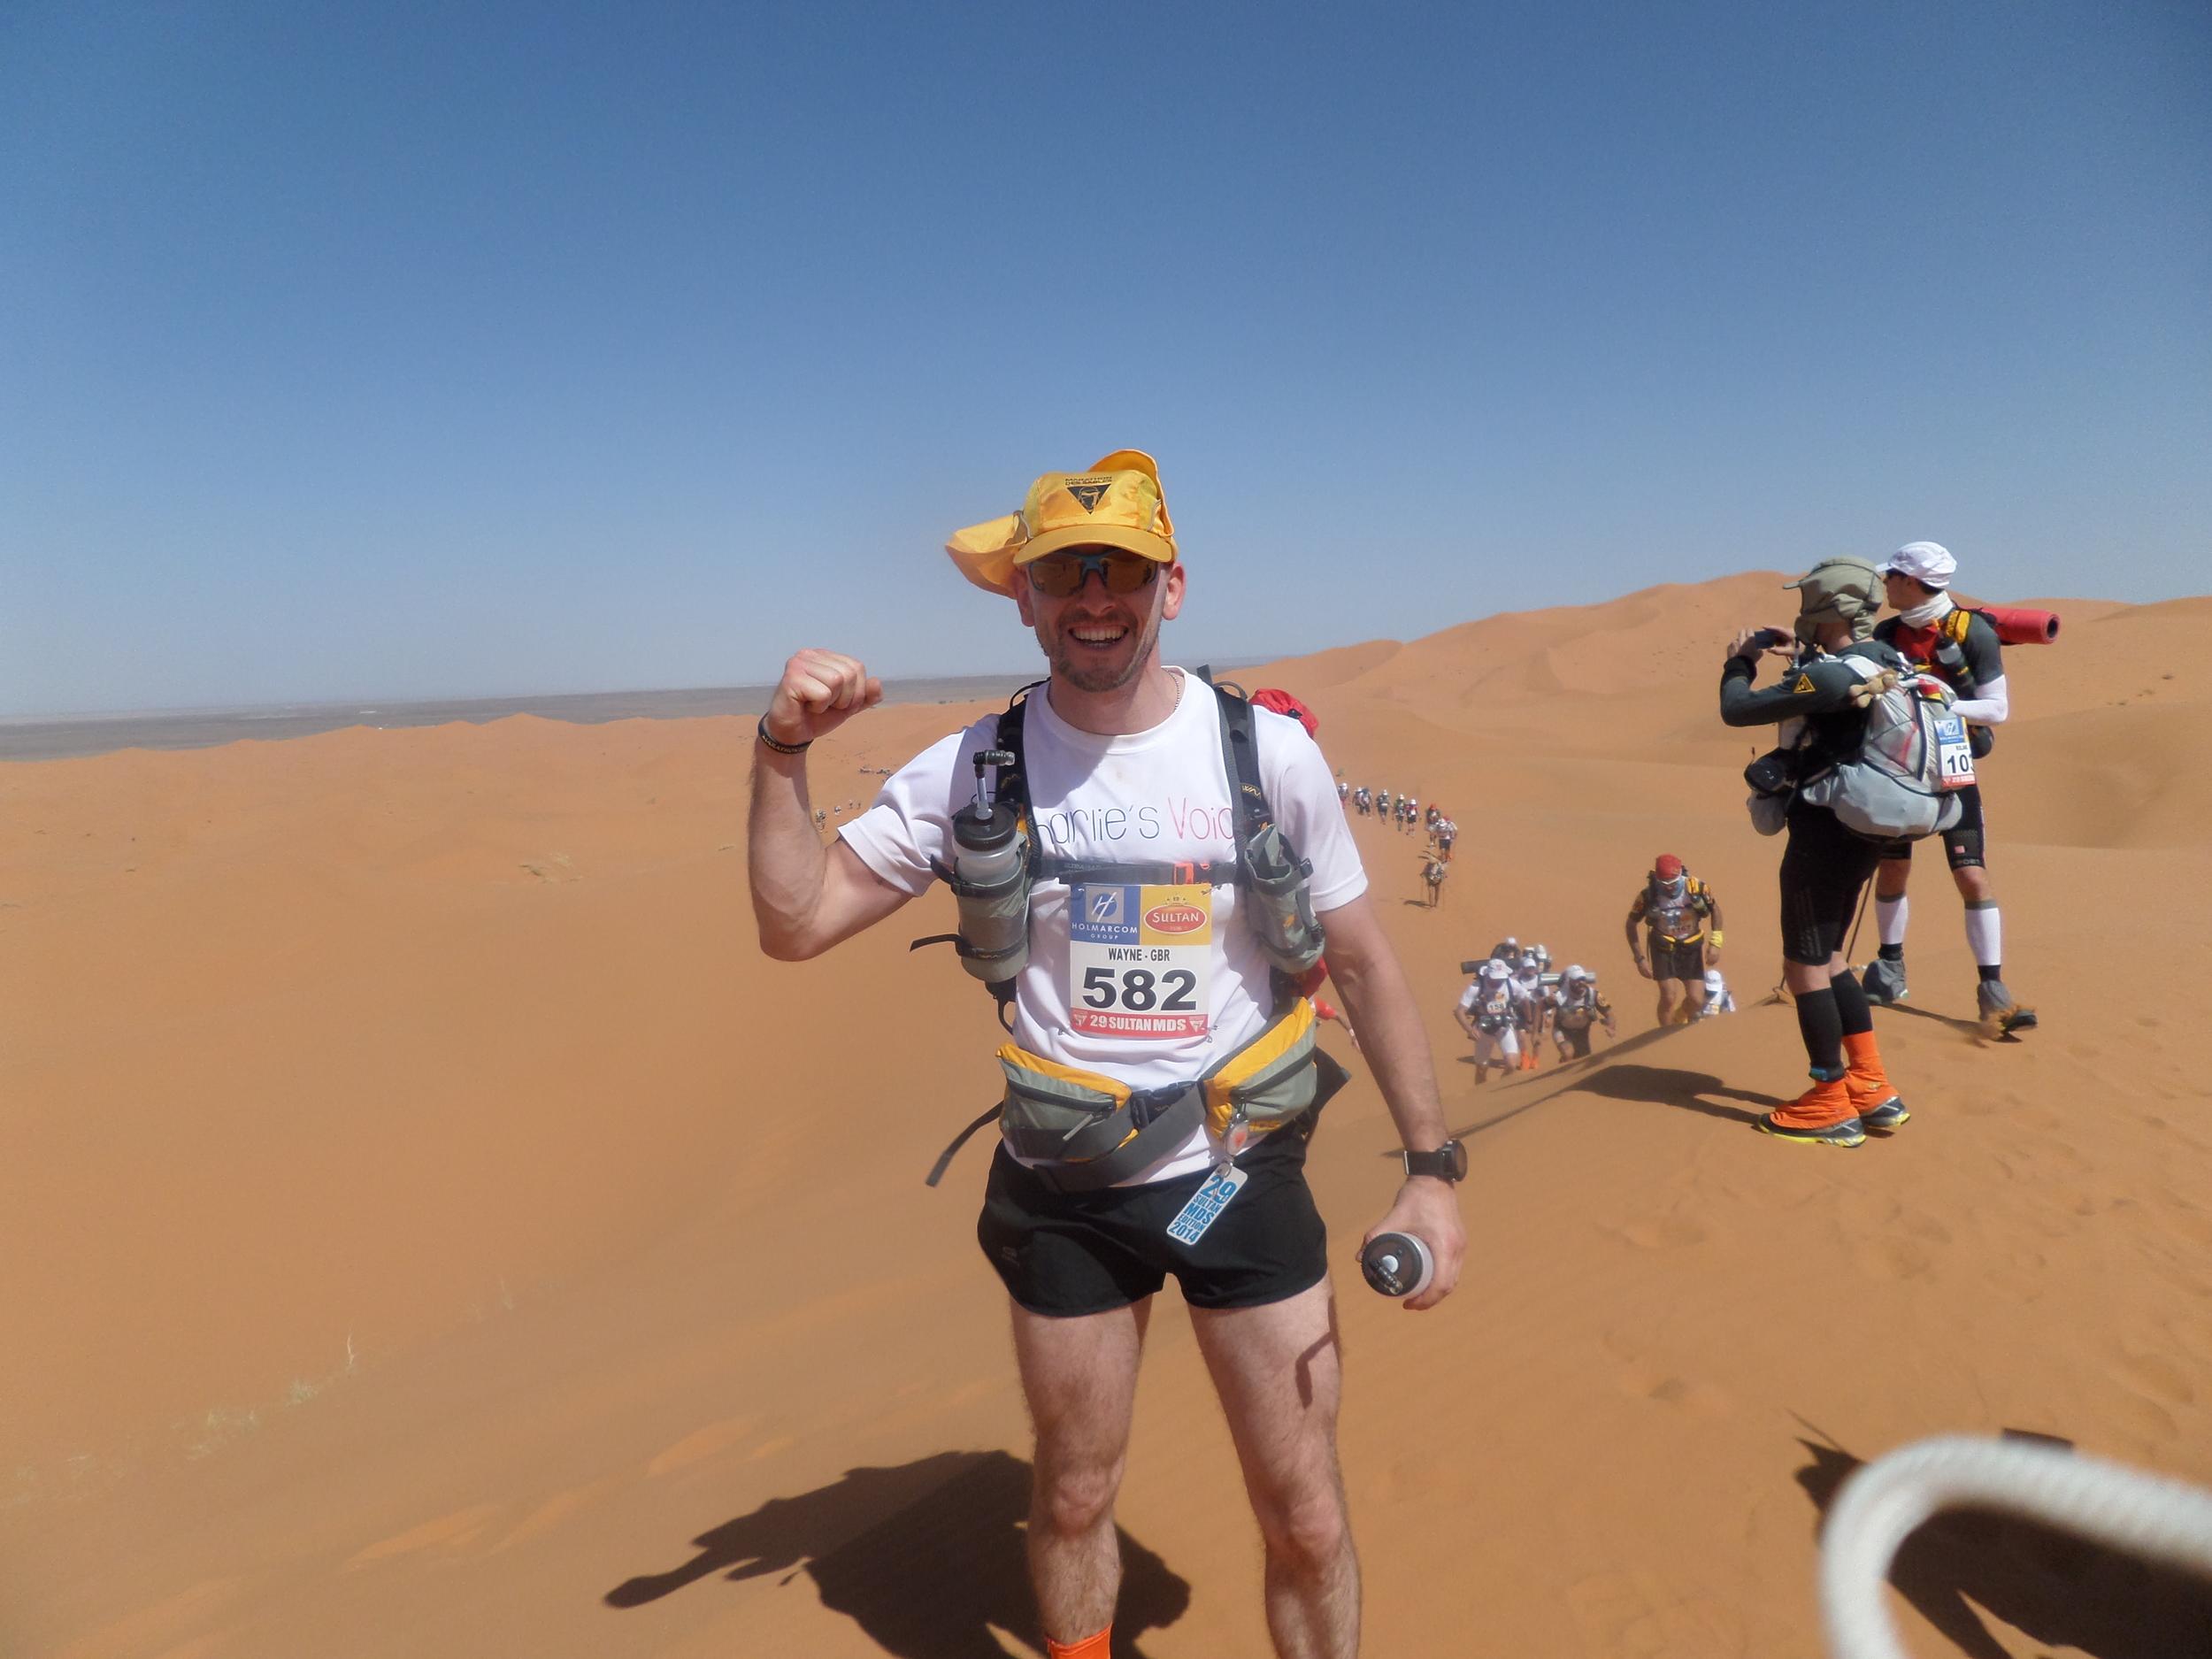 Wayne 'Kenny' Drinkwater at the 2014 Marathon des Sables